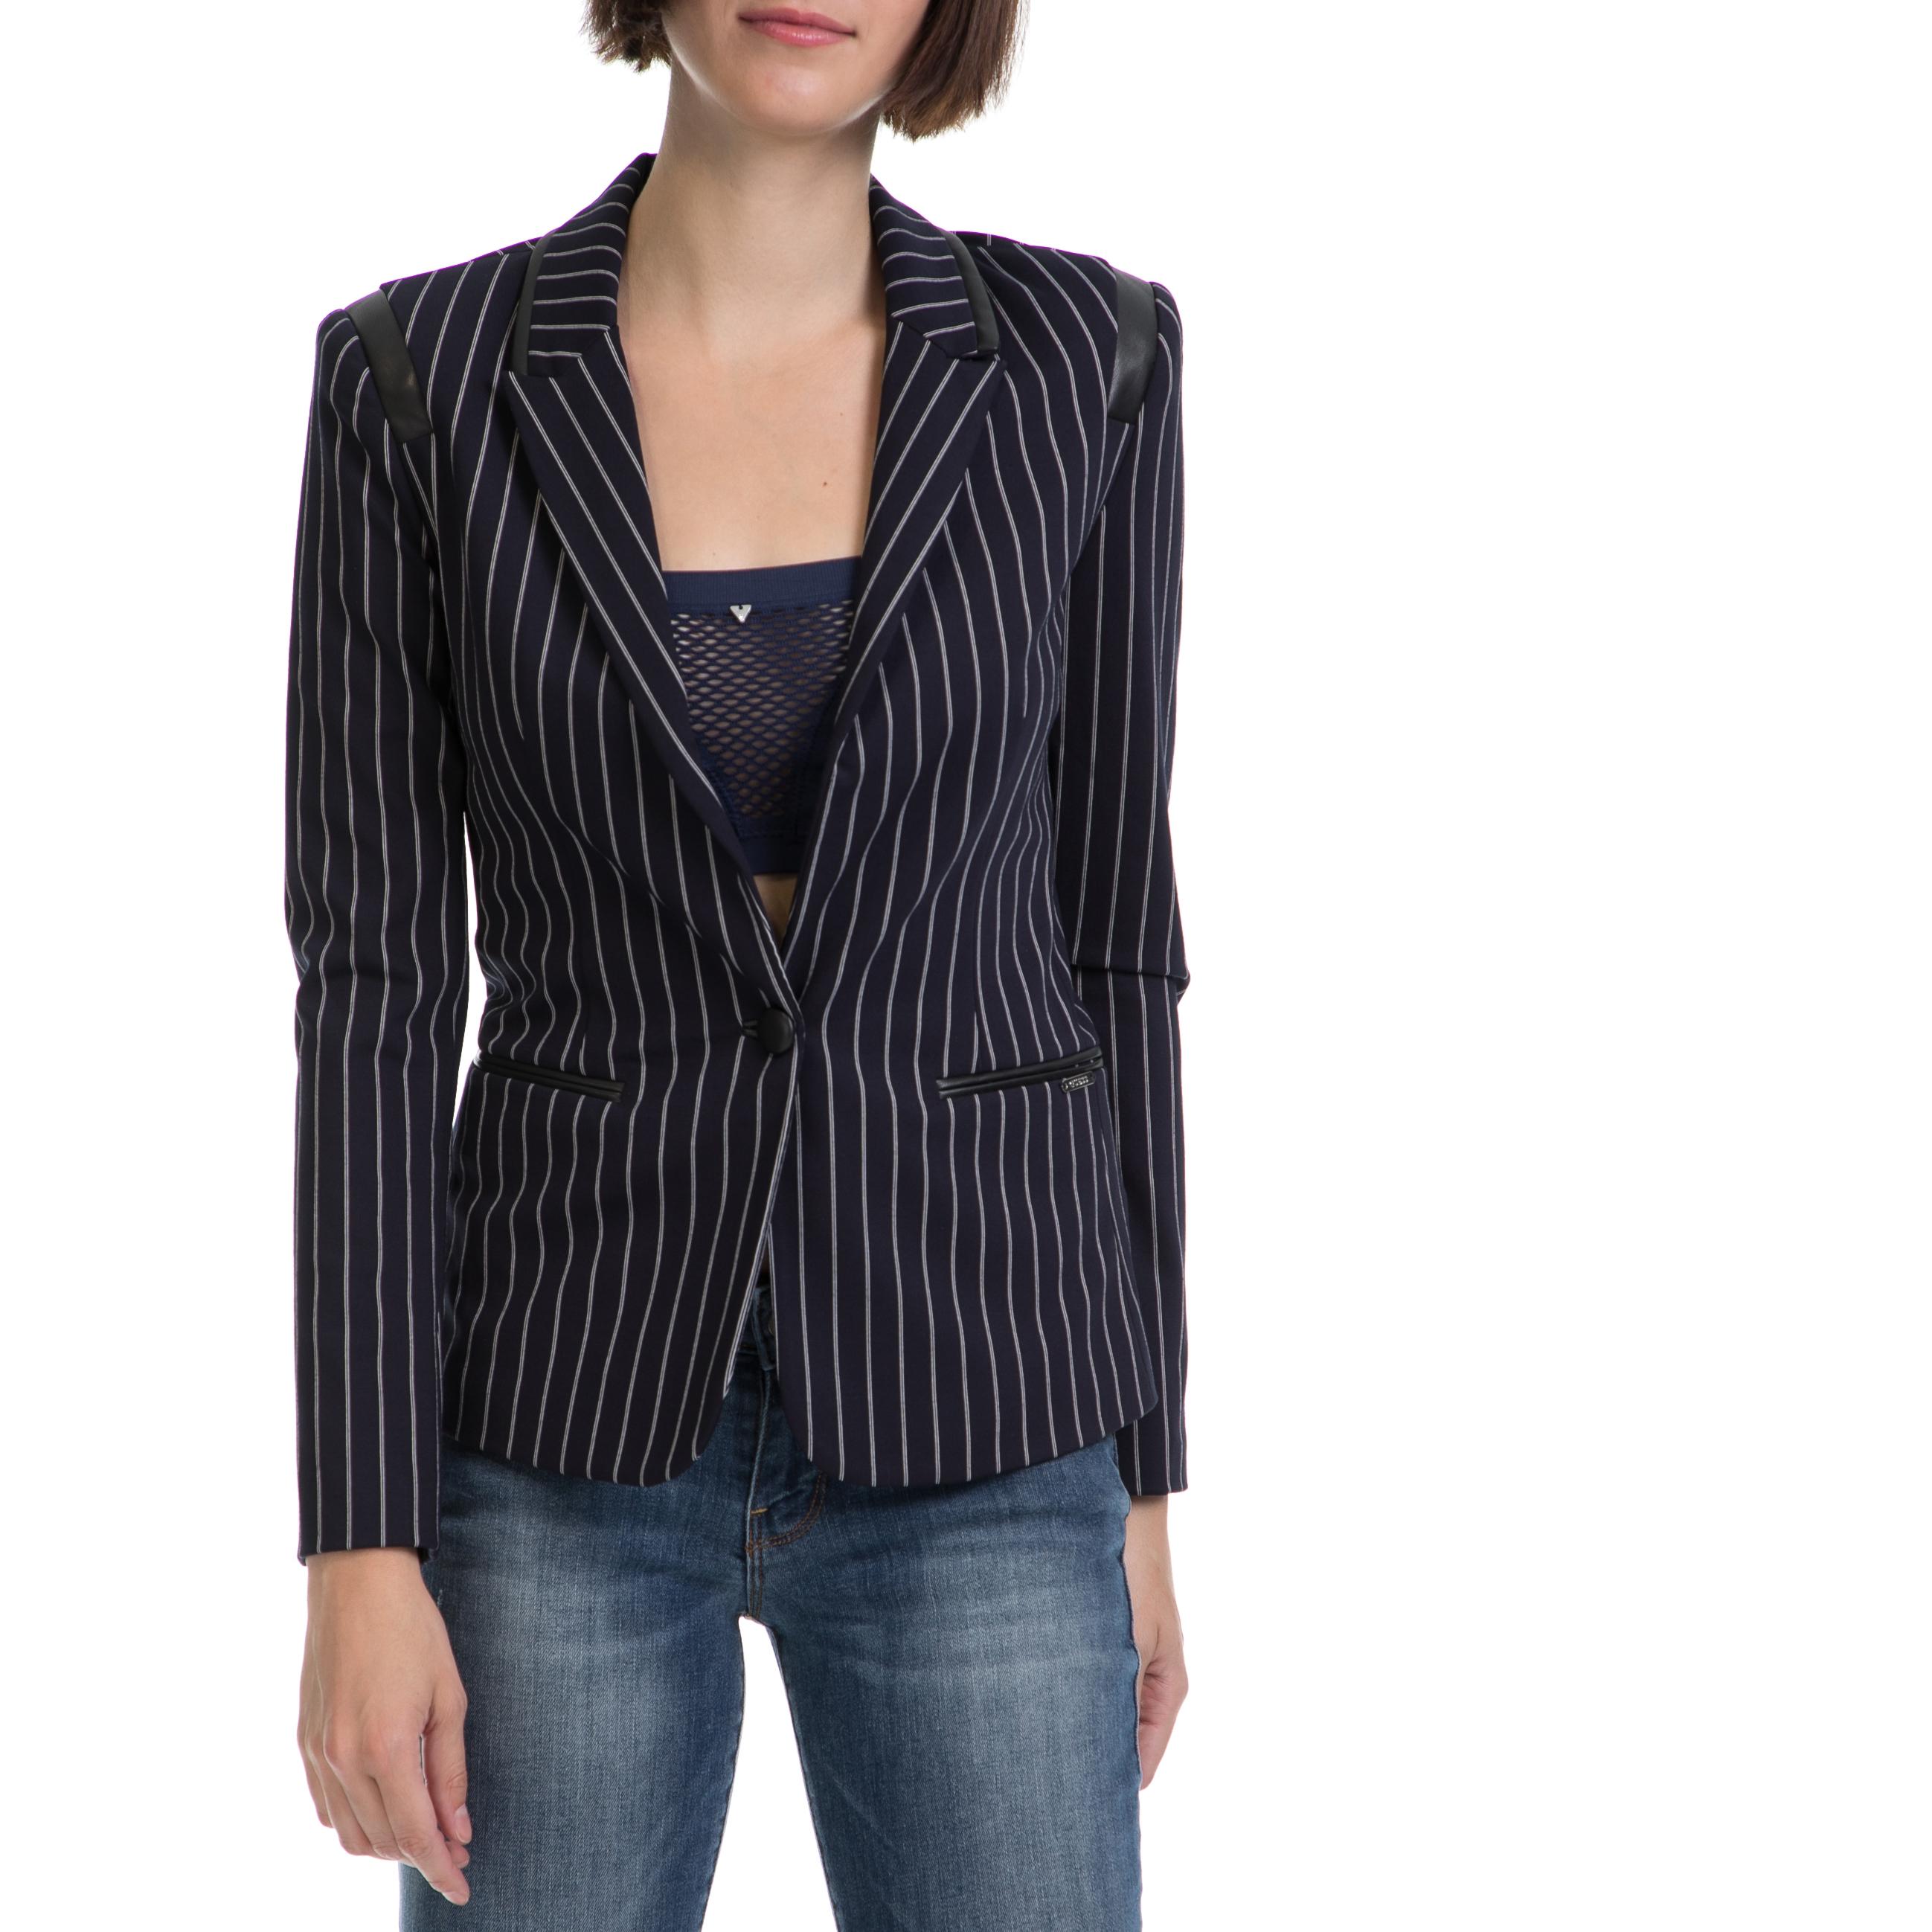 GUESS – Γυναικείο σακάκι GUESS μαύρο